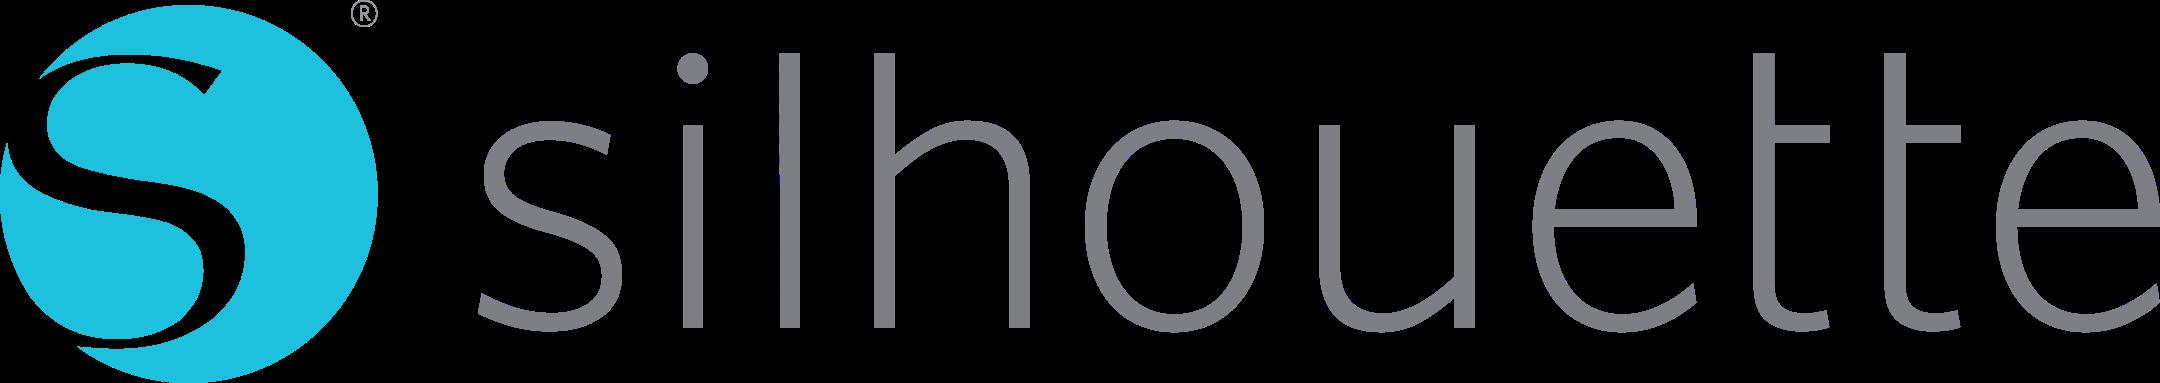 silhouette logo 1 - Silhouette Logo